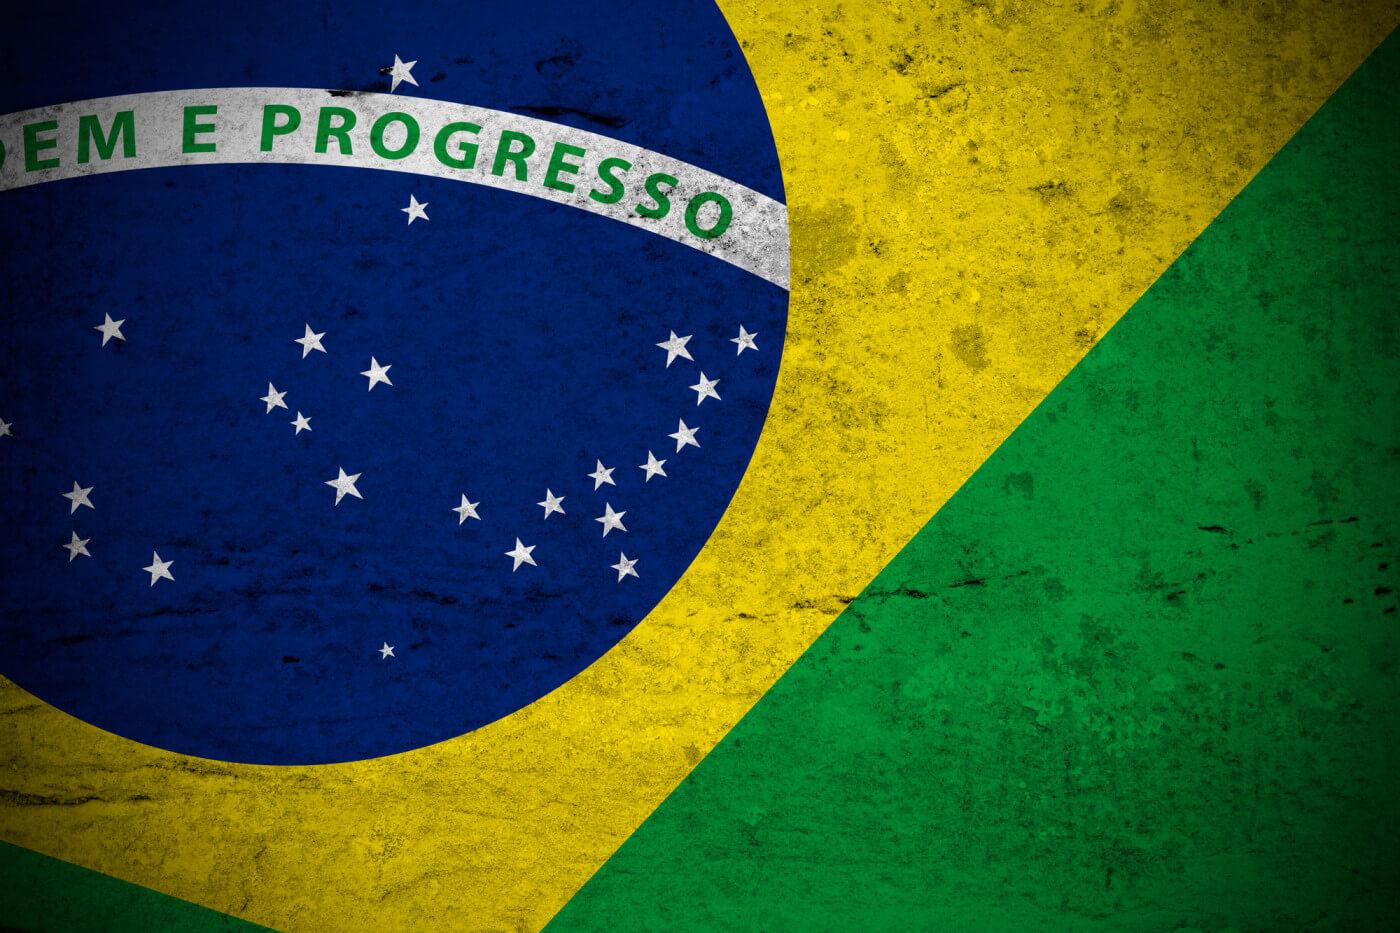 Uma carta aberta ao Brasil